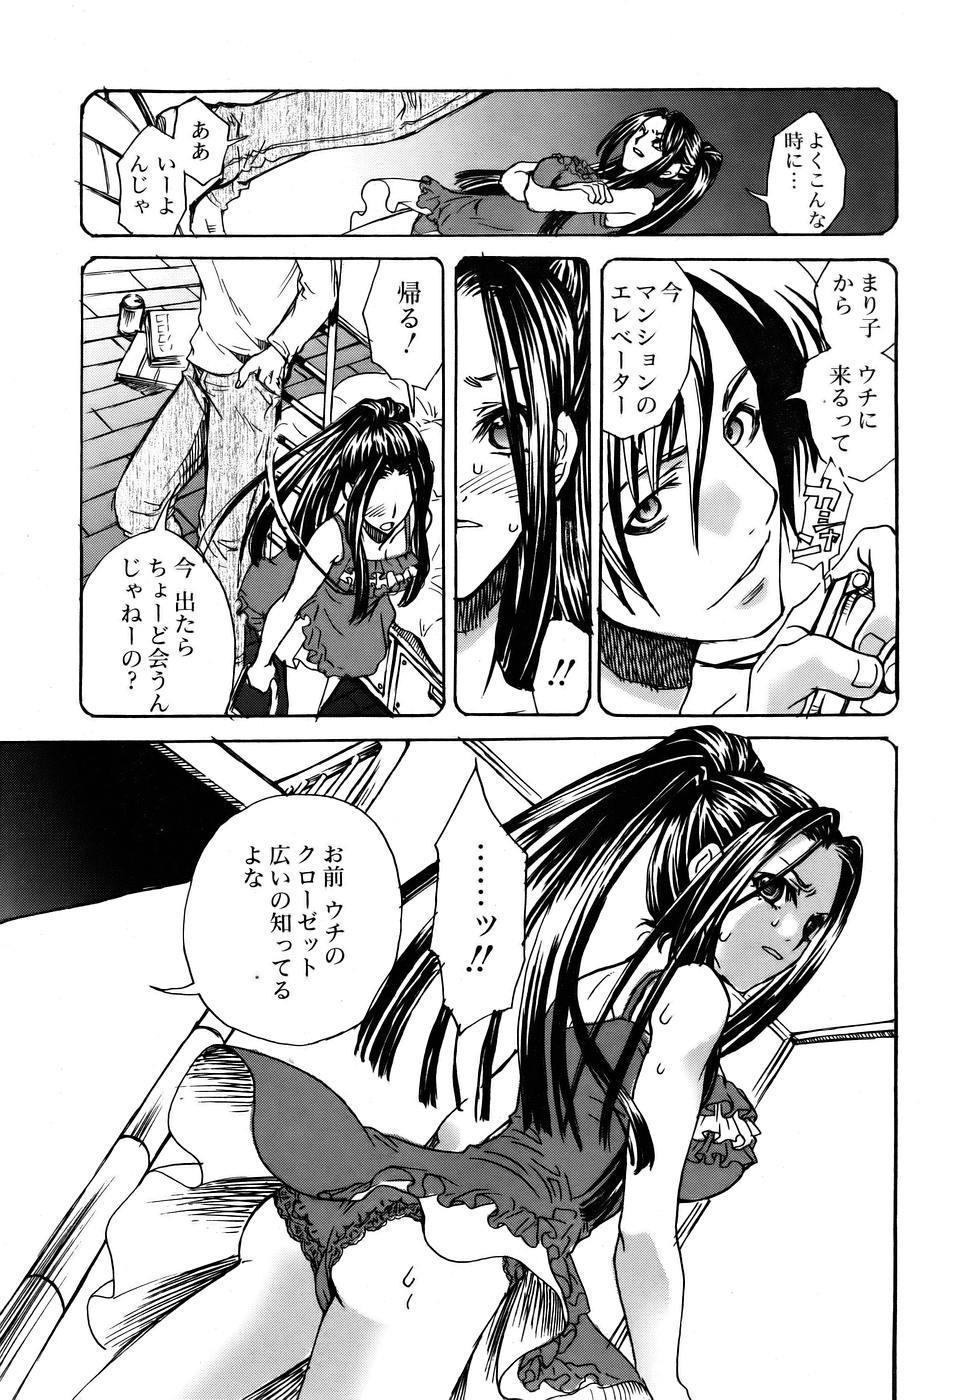 COMIC AUN 2005-12 Vol. 115 146